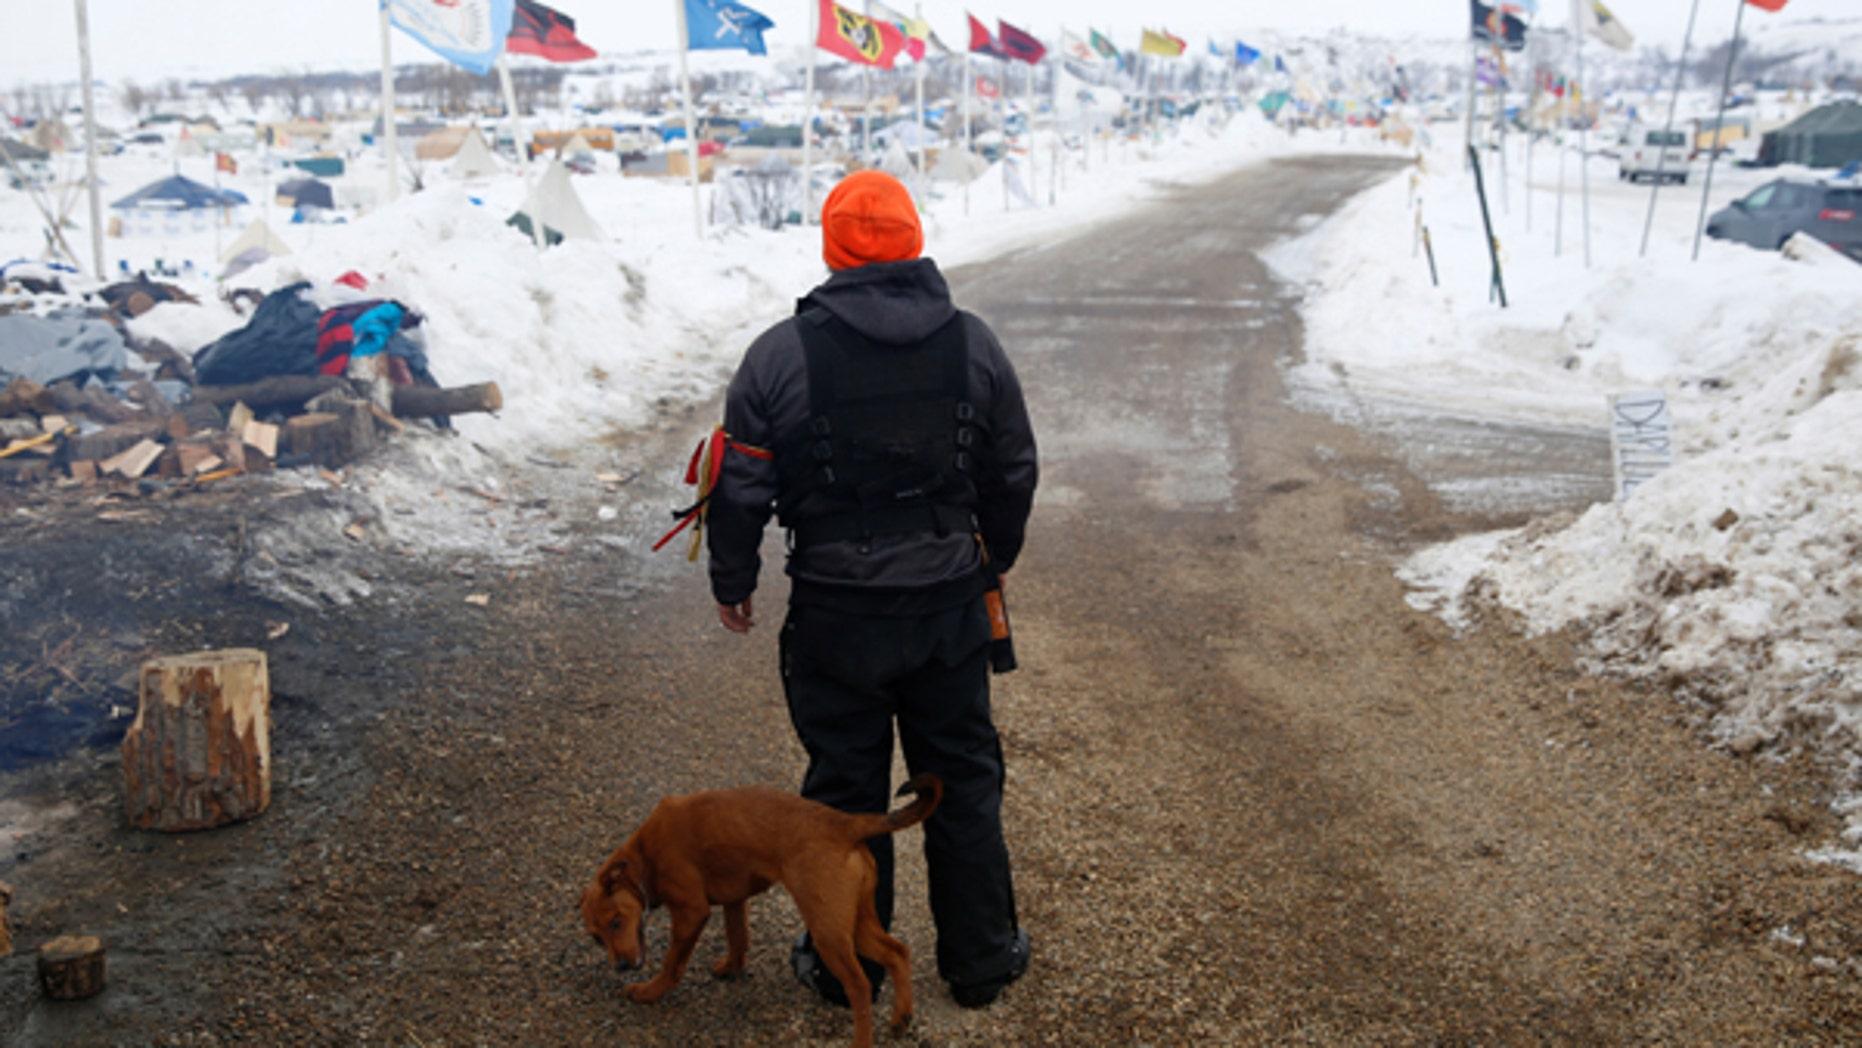 A security volunteer stands in the Dakota Access Pipeline protest camp near Cannon Ball, North Dakota, U.S., January 24, 2017.